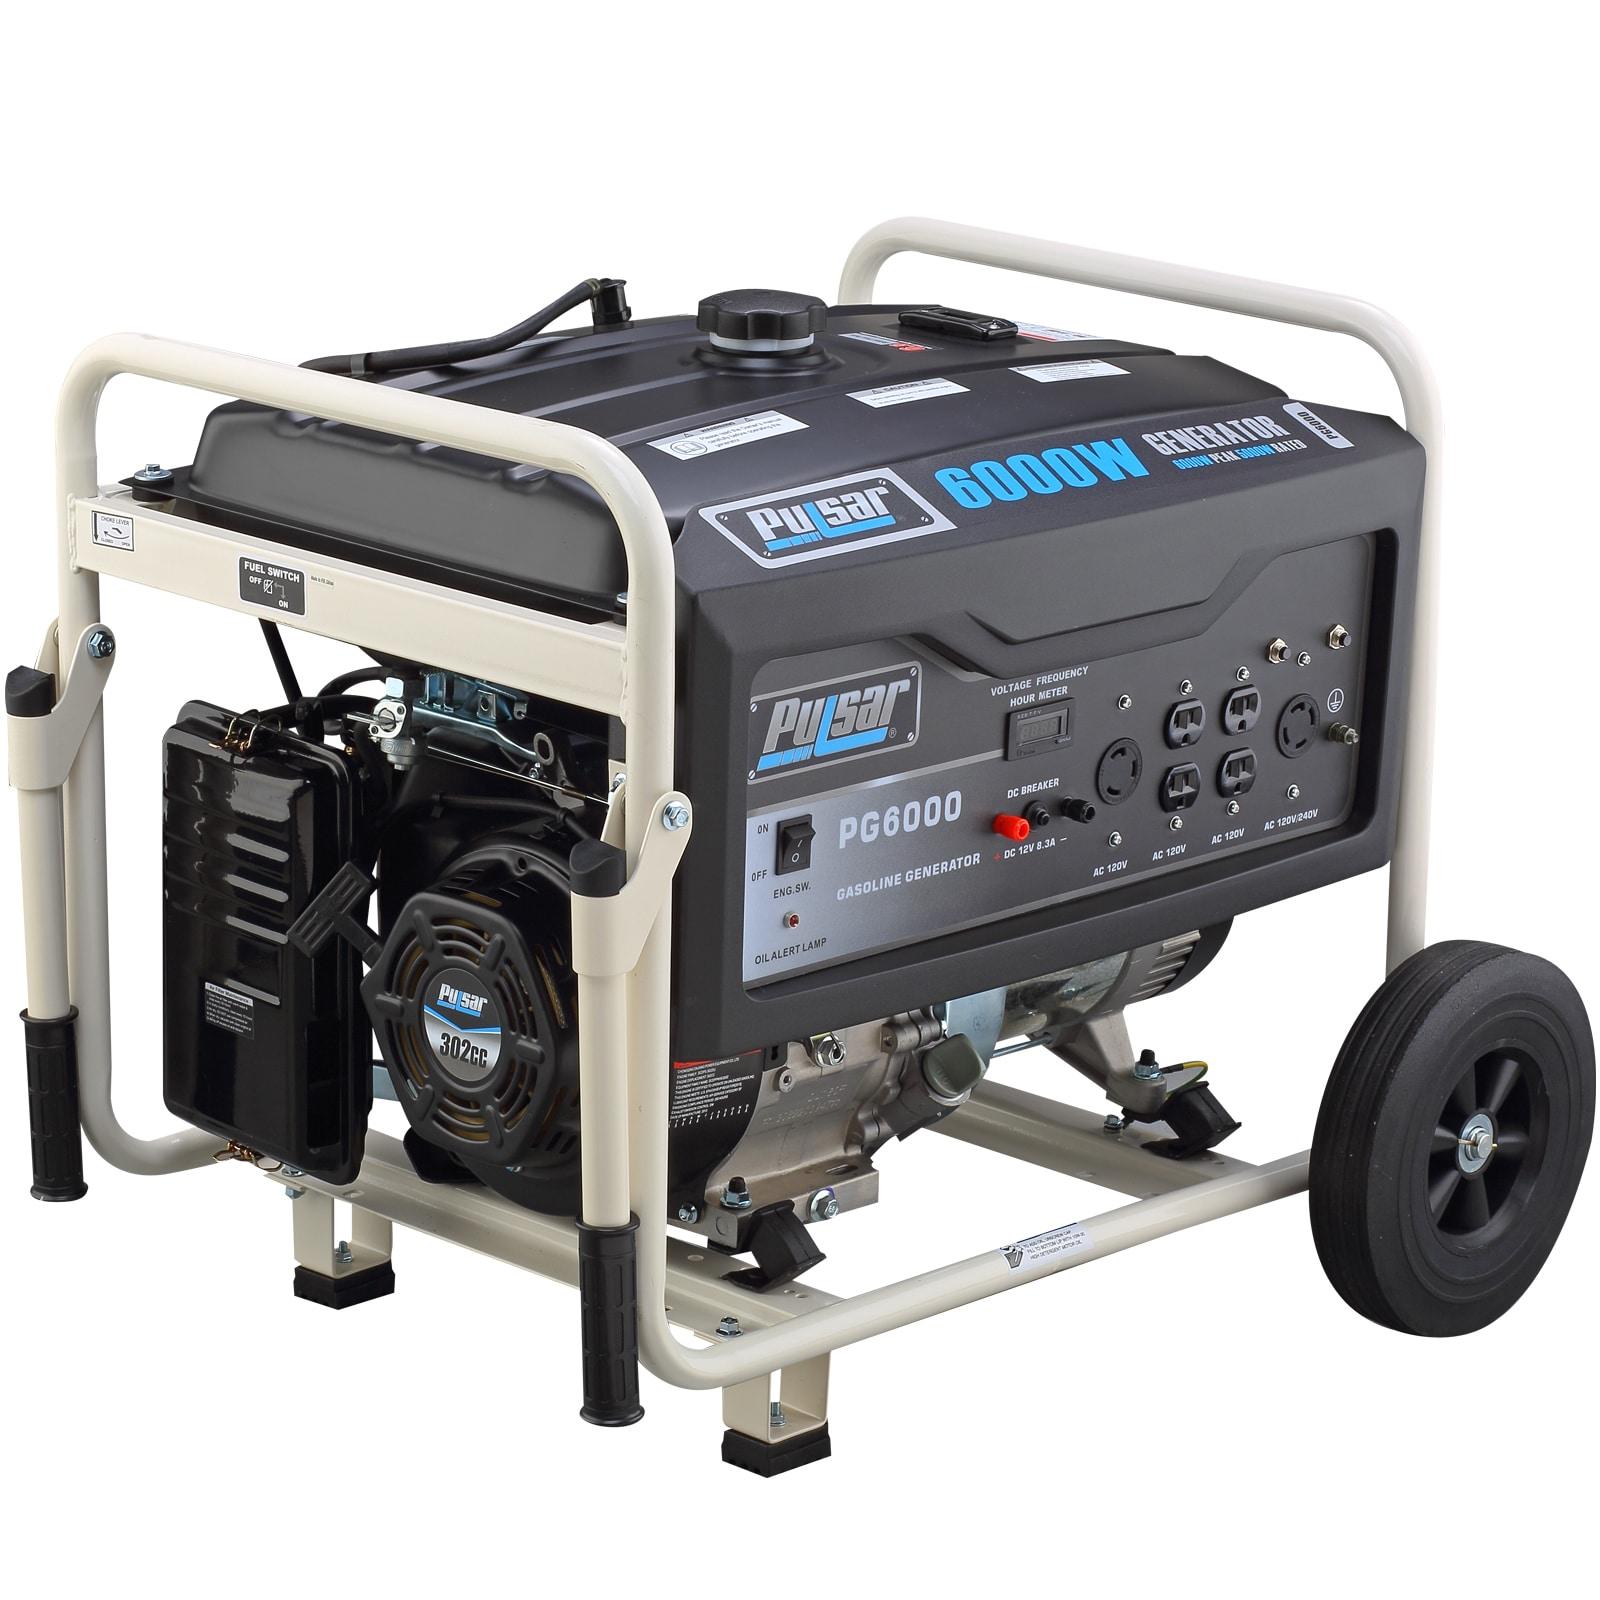 Pulsar Products 6 000 watt Gasoline Powered Portable Generator